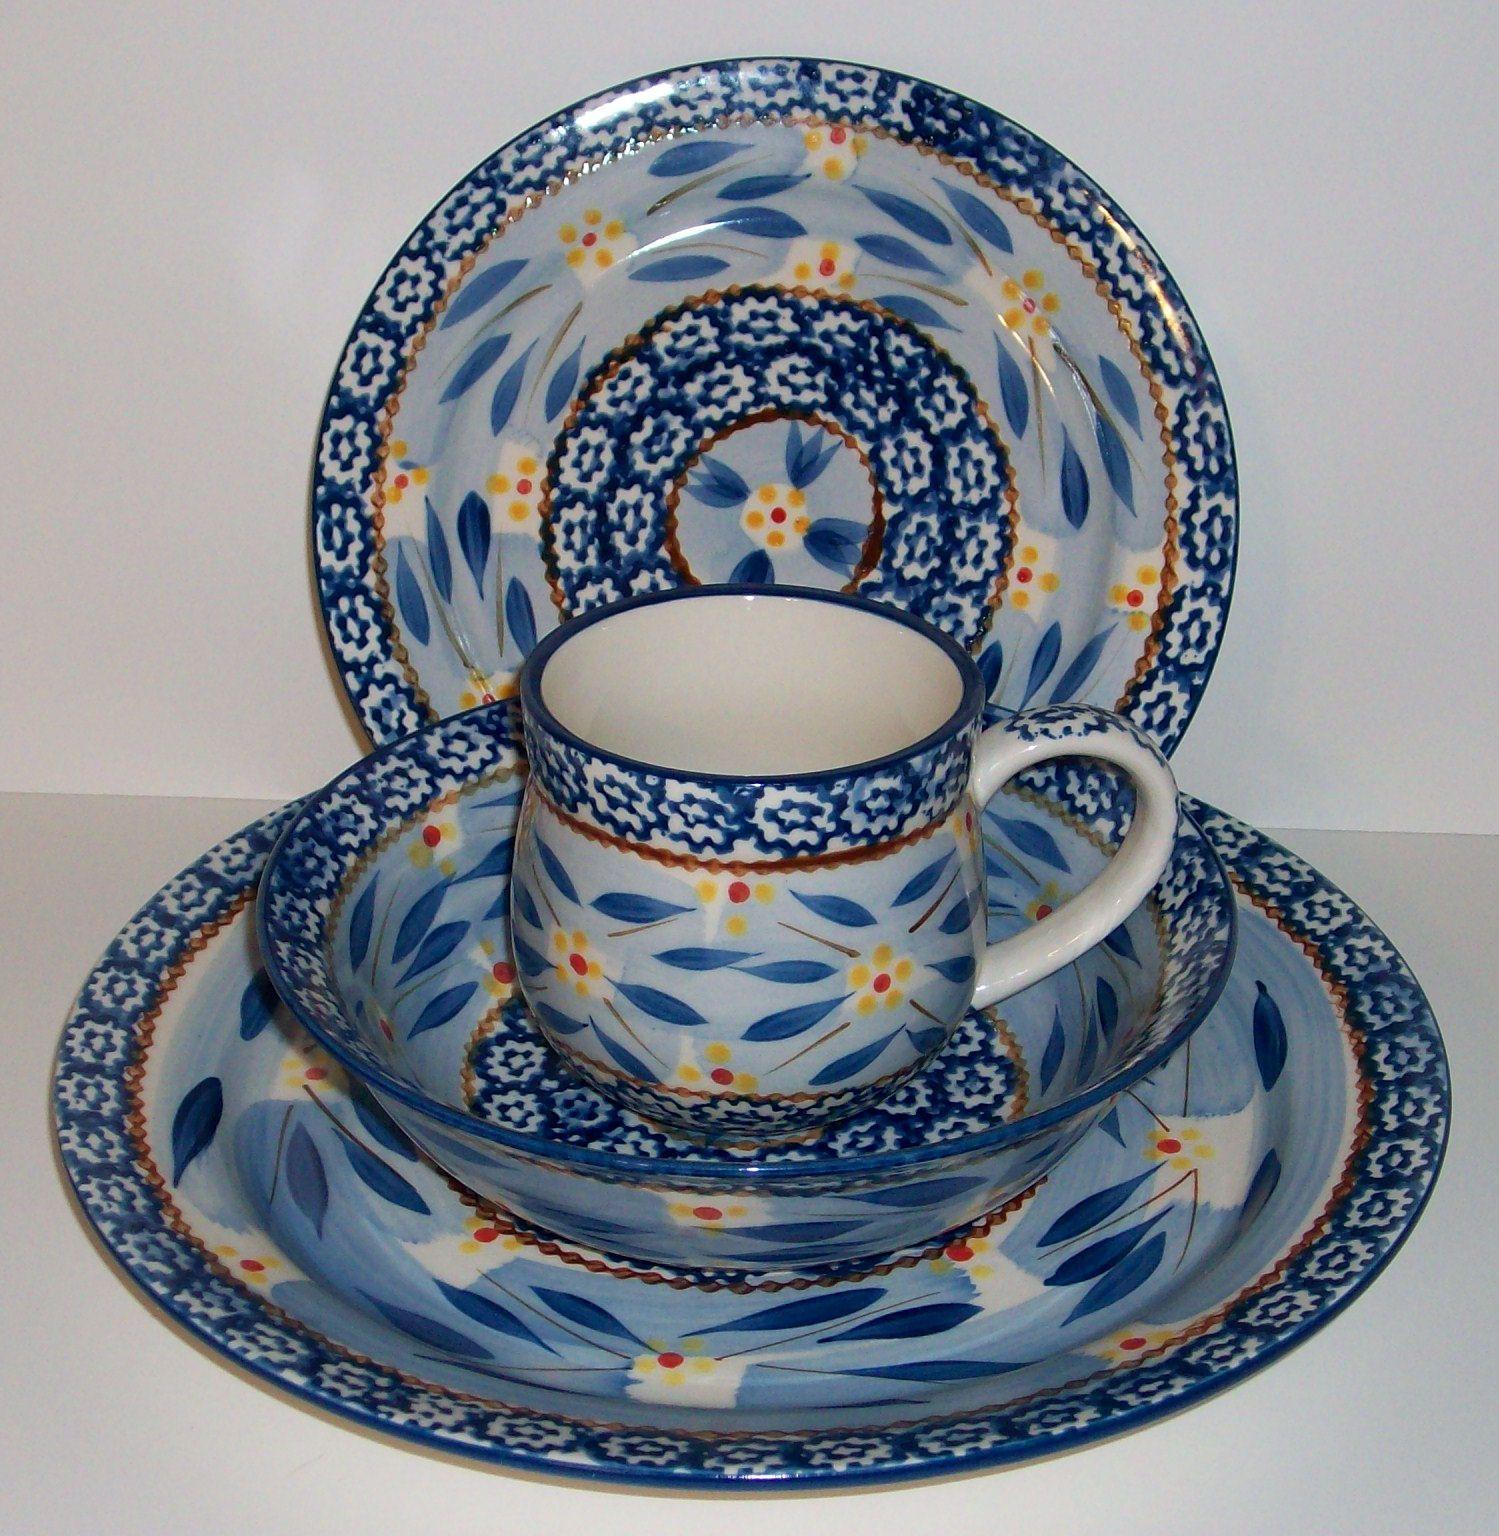 temptations dinnerware old world | TEMP-TATIONS TEMPTATIONS 4PC DINNERWARE SET-OLD WORLD BLUE - NEW-SHOP . & Temp-tations temptations 4pc dinnerware set-old world blue - new ...